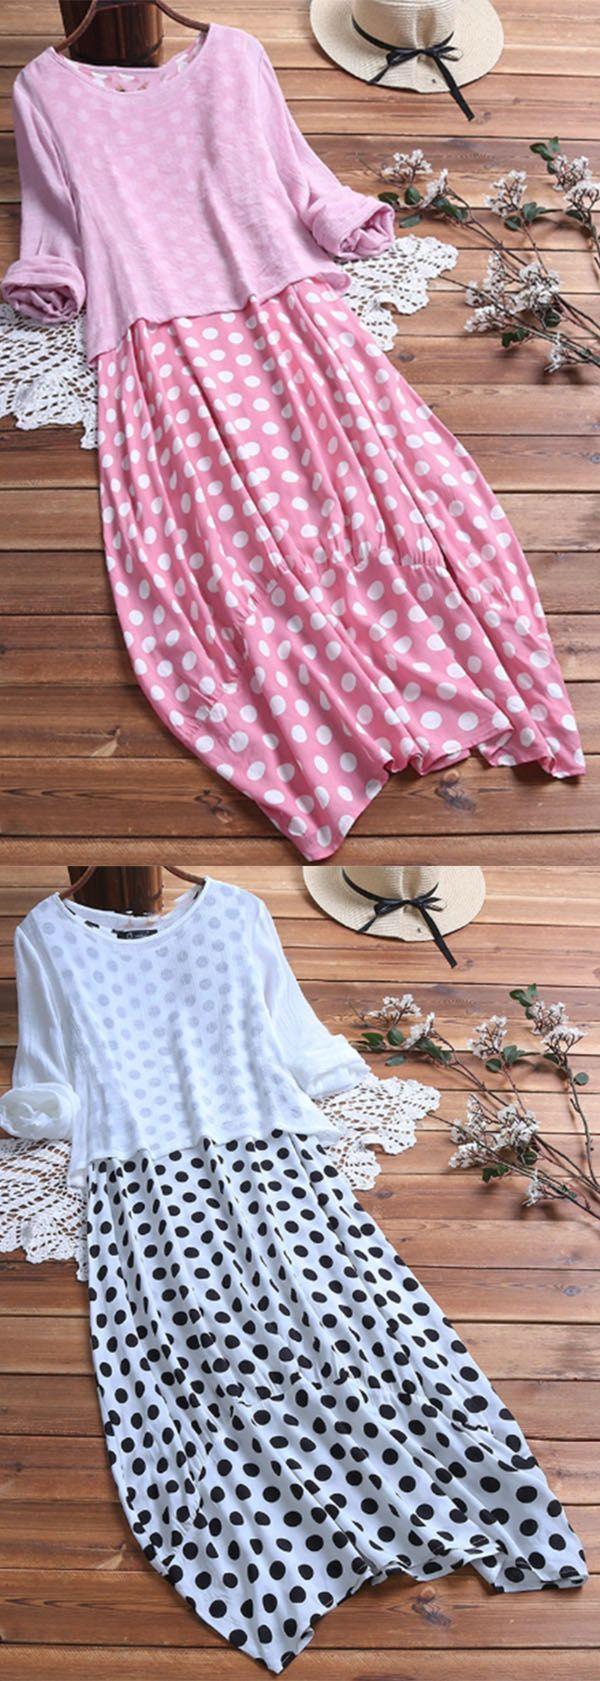 Hot Sale!Polka Dot Long Sleeve Women's Two Piece Plus Size Dresses -   19 diy storage for kids ideas